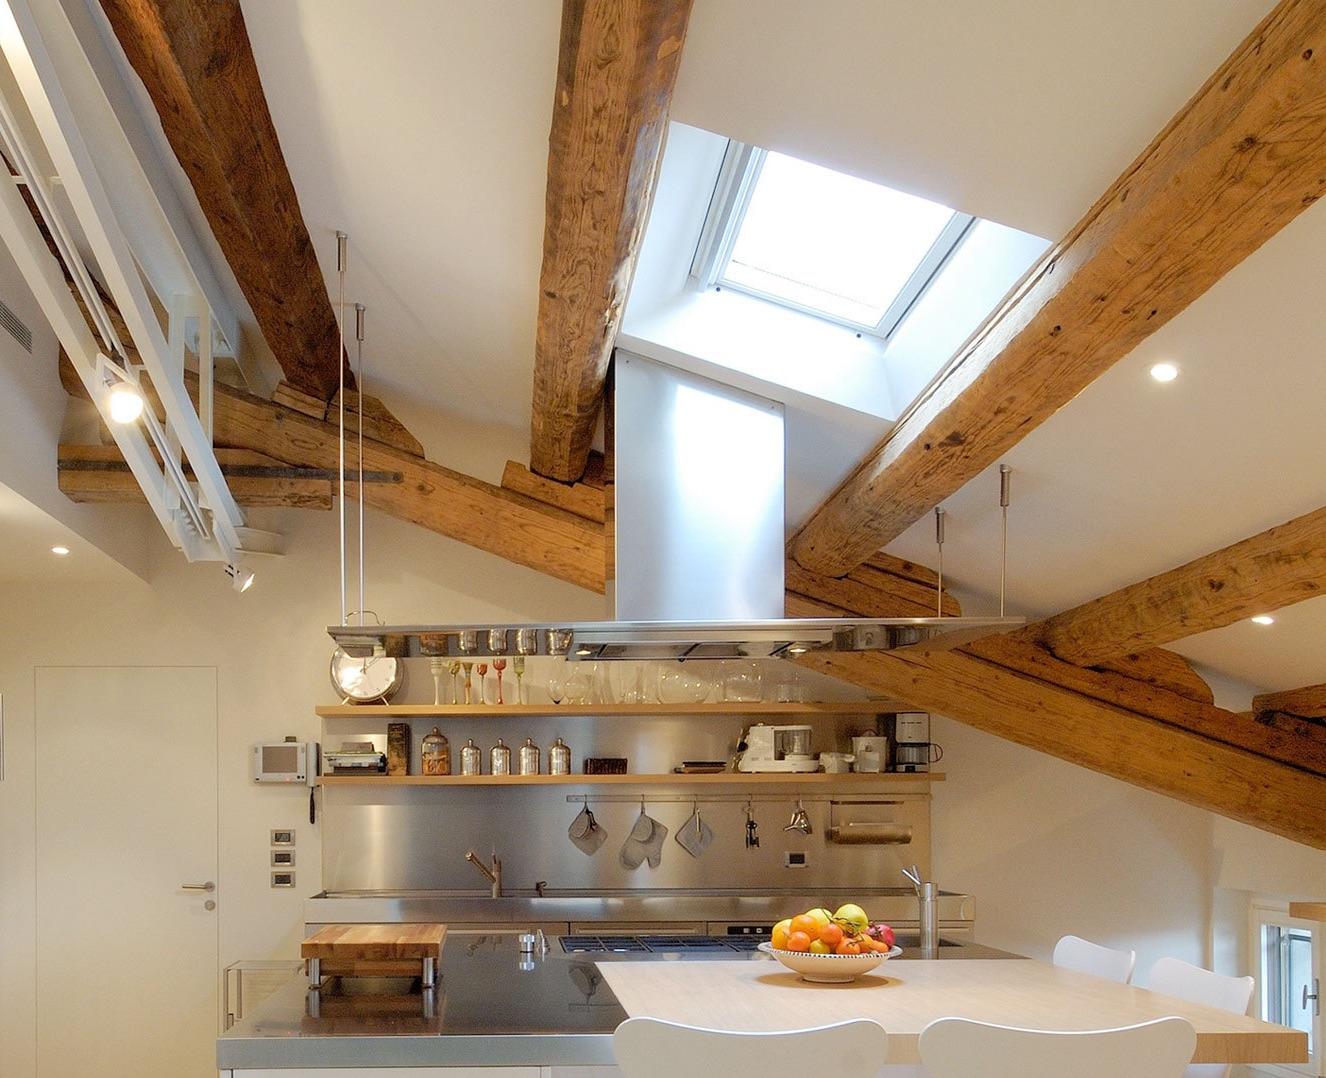 10 idee per rendere la vostra cucina spettacolare - Mensole cucina moderna ...